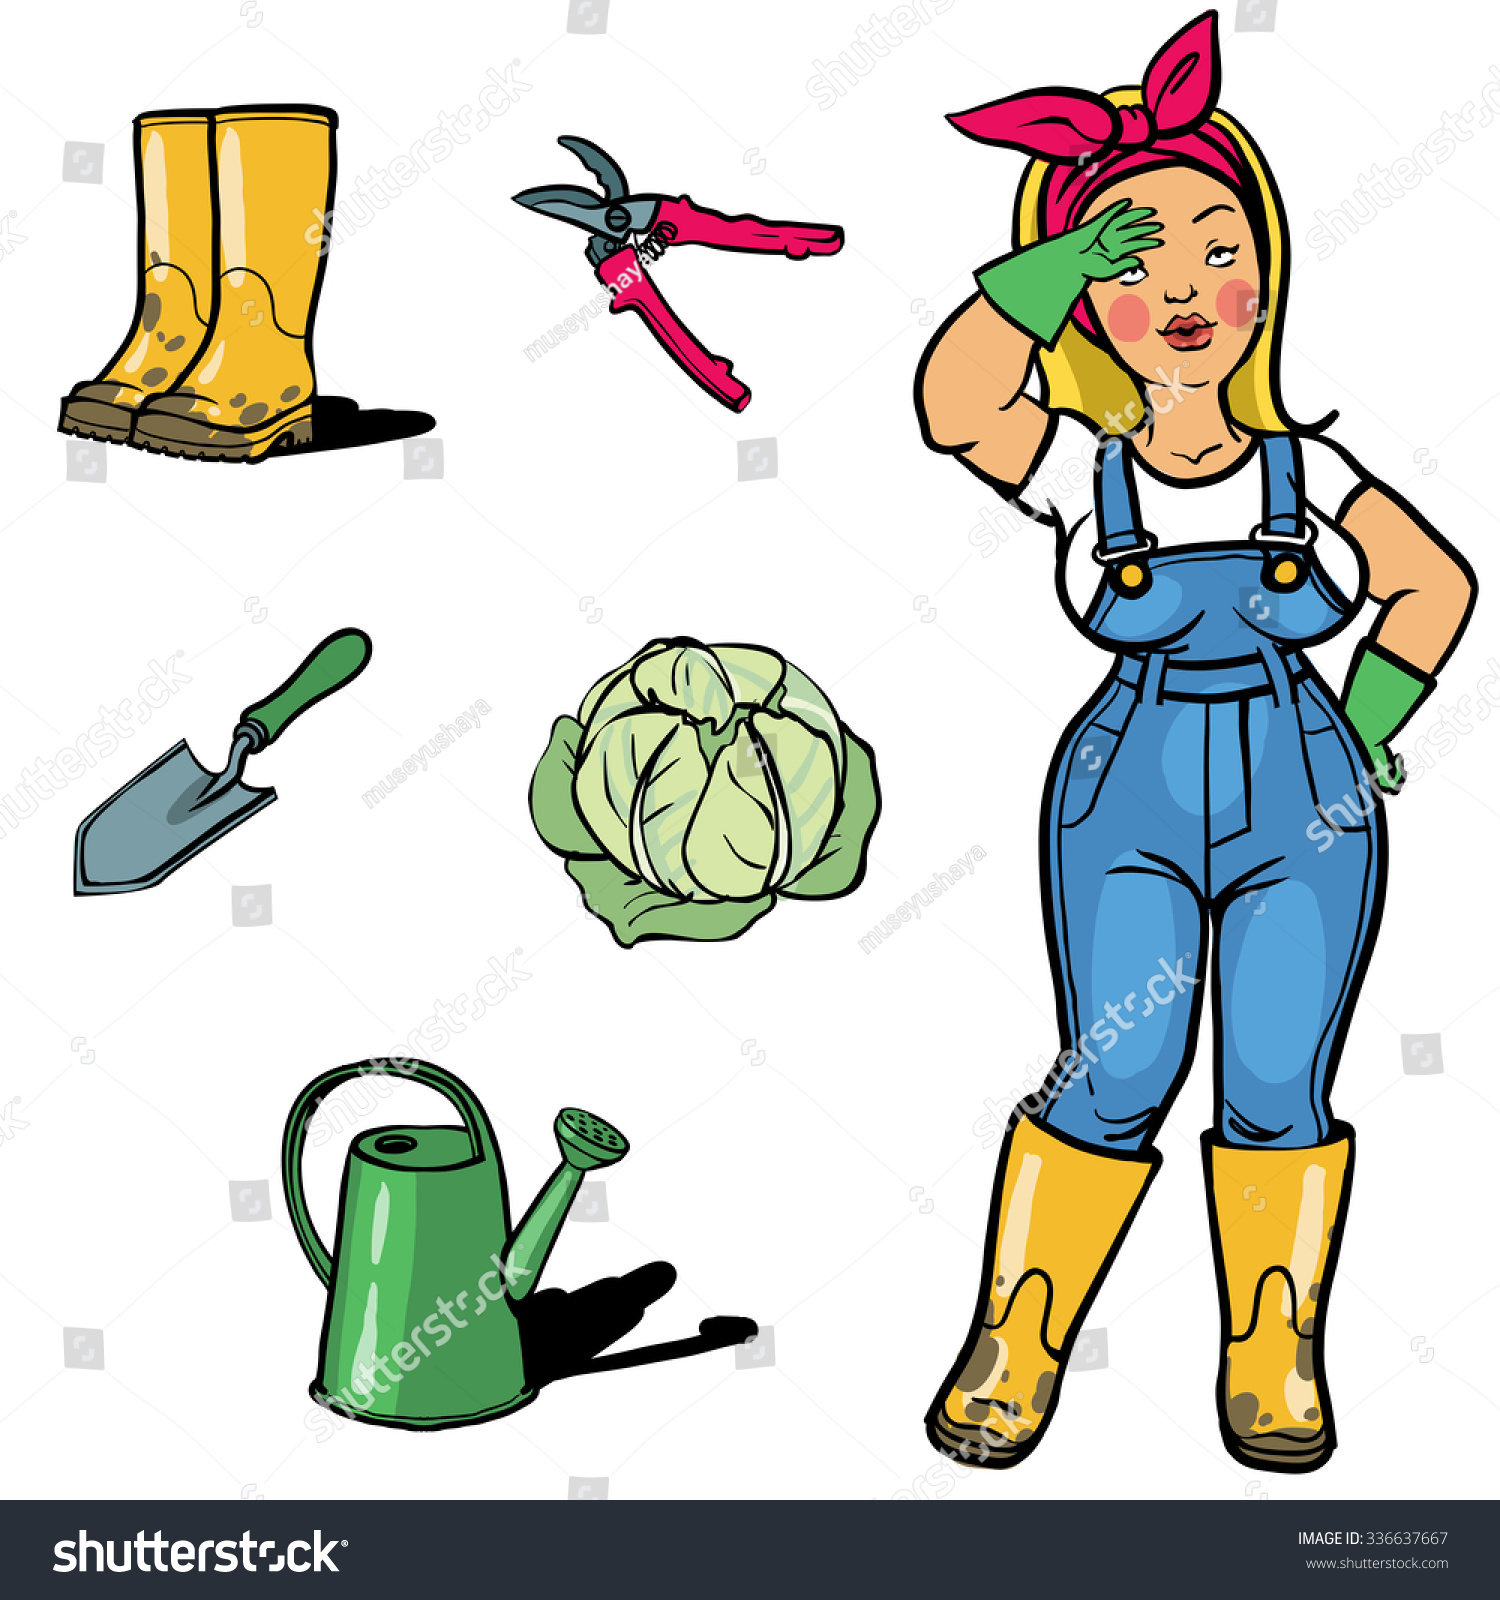 stock vector ve able gardener cartoon character sign ang garden tools a cartoon woman gardener tired after